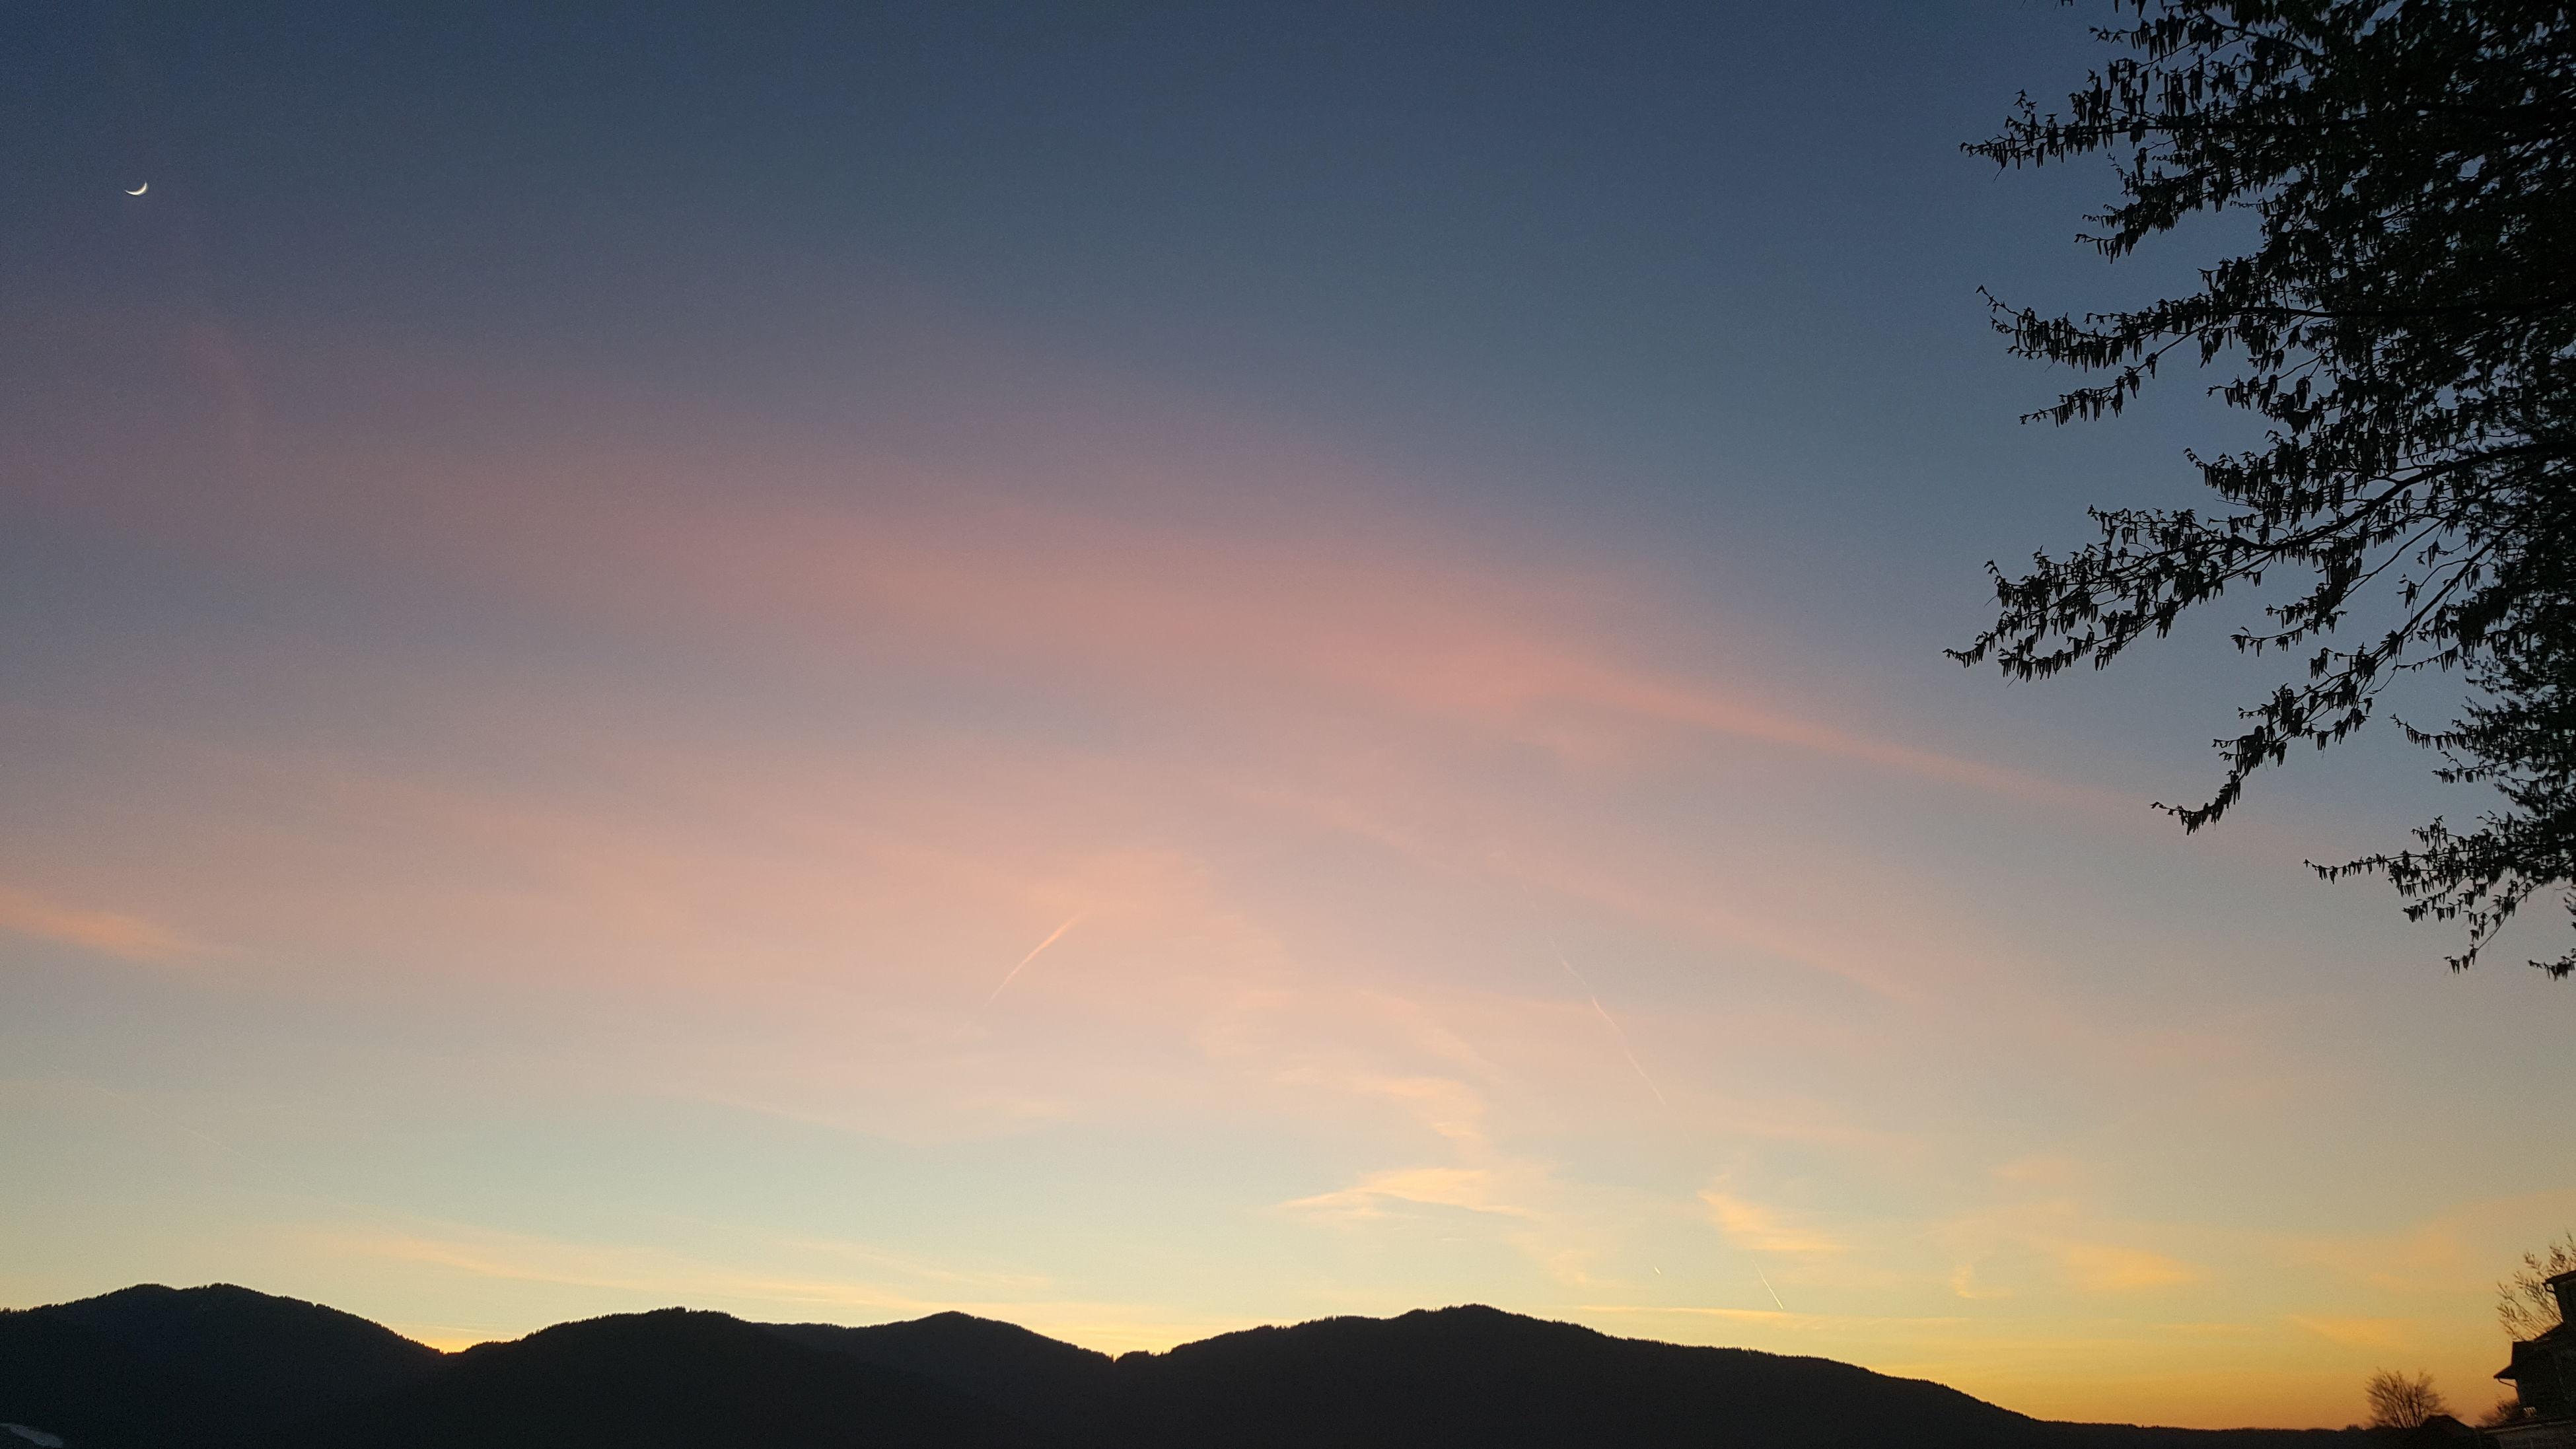 silhouette, tranquil scene, scenics, tranquility, beauty in nature, sunset, mountain, sky, nature, landscape, idyllic, mountain range, tree, non-urban scene, dusk, copy space, majestic, orange color, non urban scene, outdoors